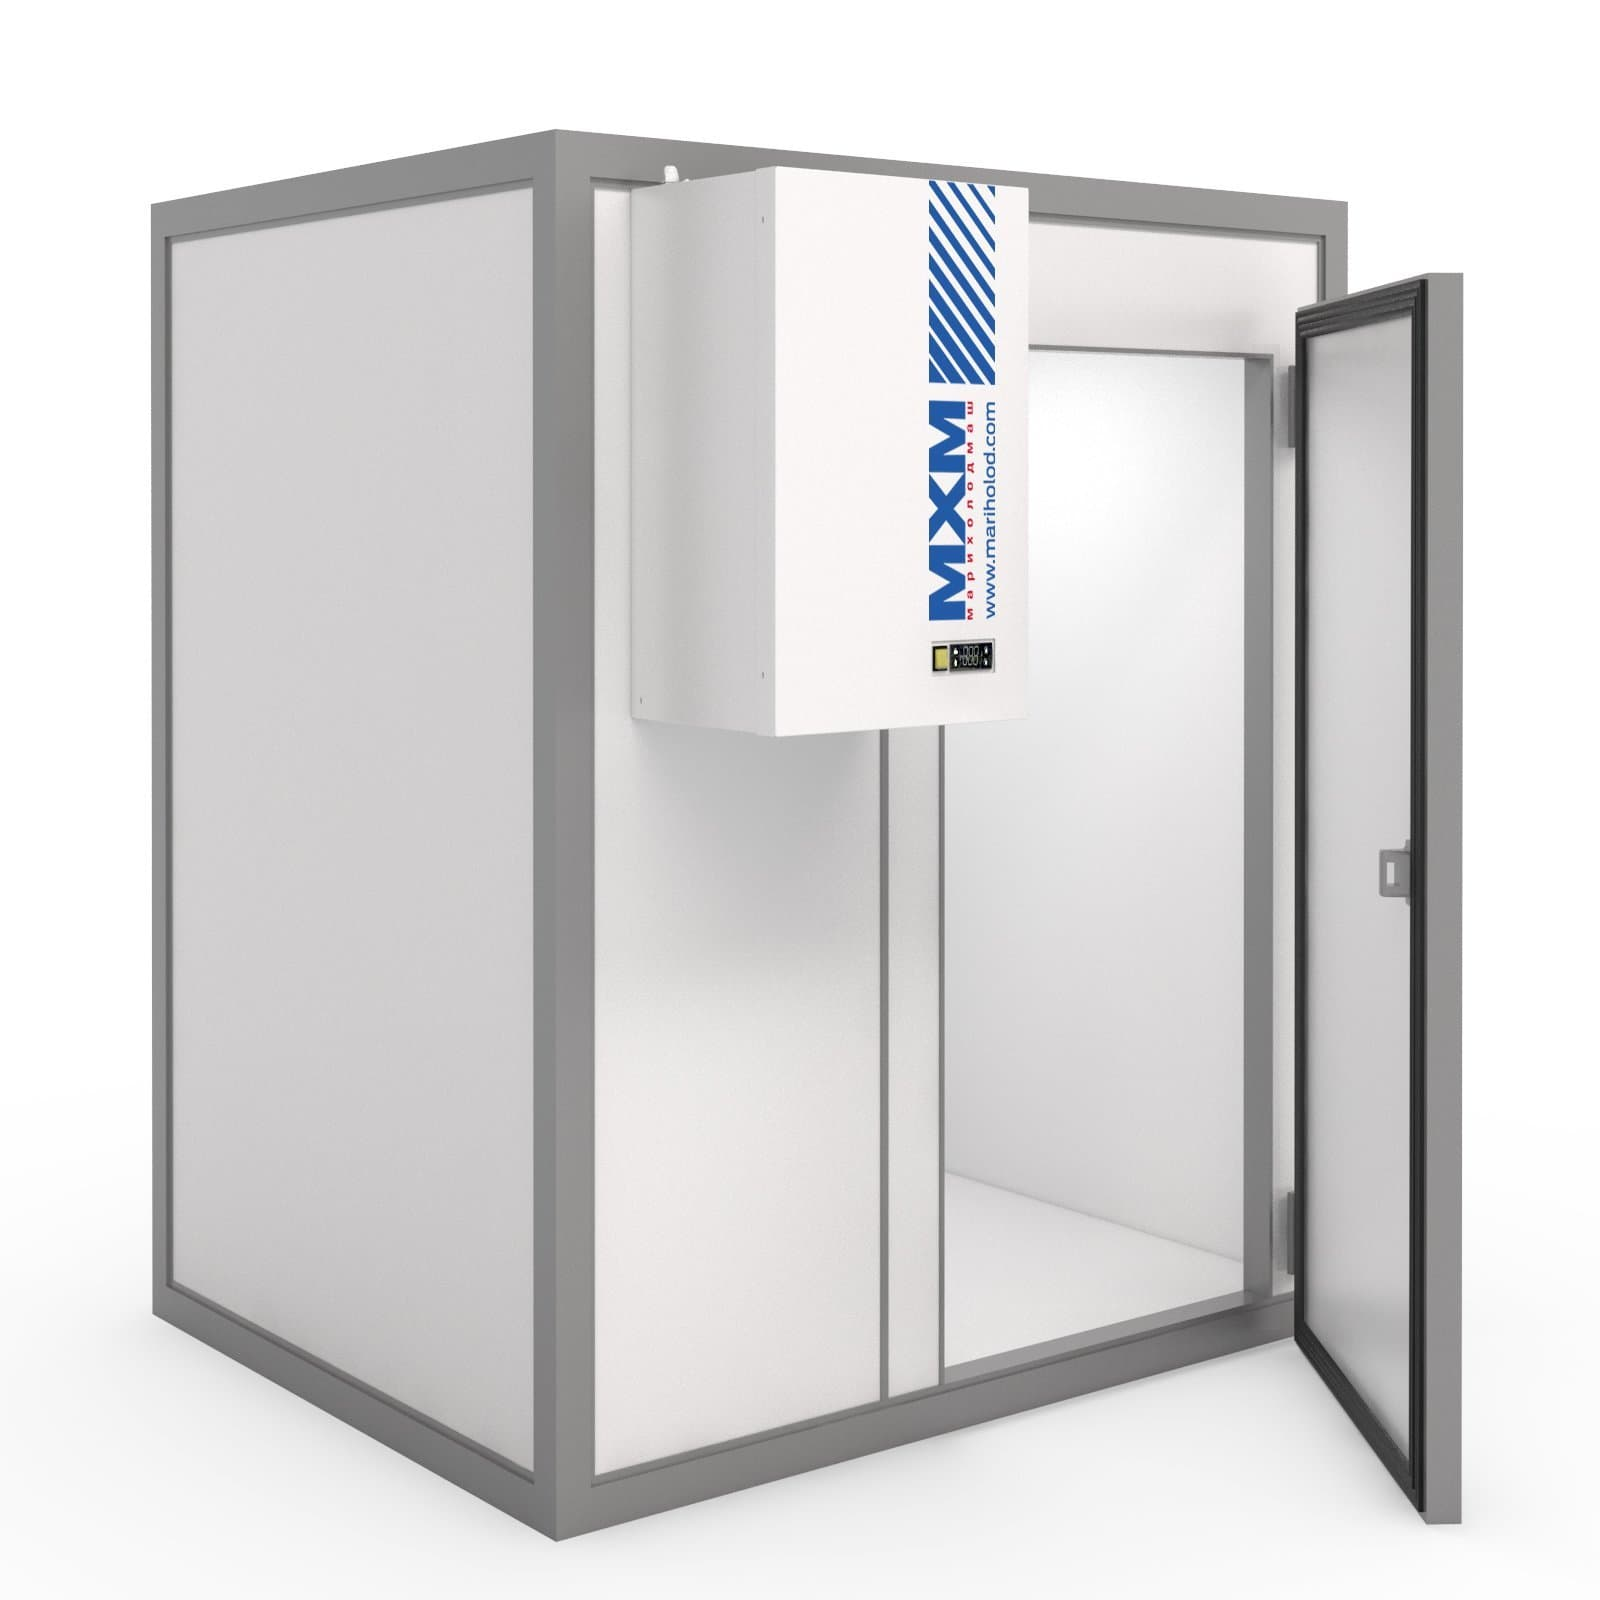 Камера холодильная КХН-81,10 (2560×13360×2720 мм)